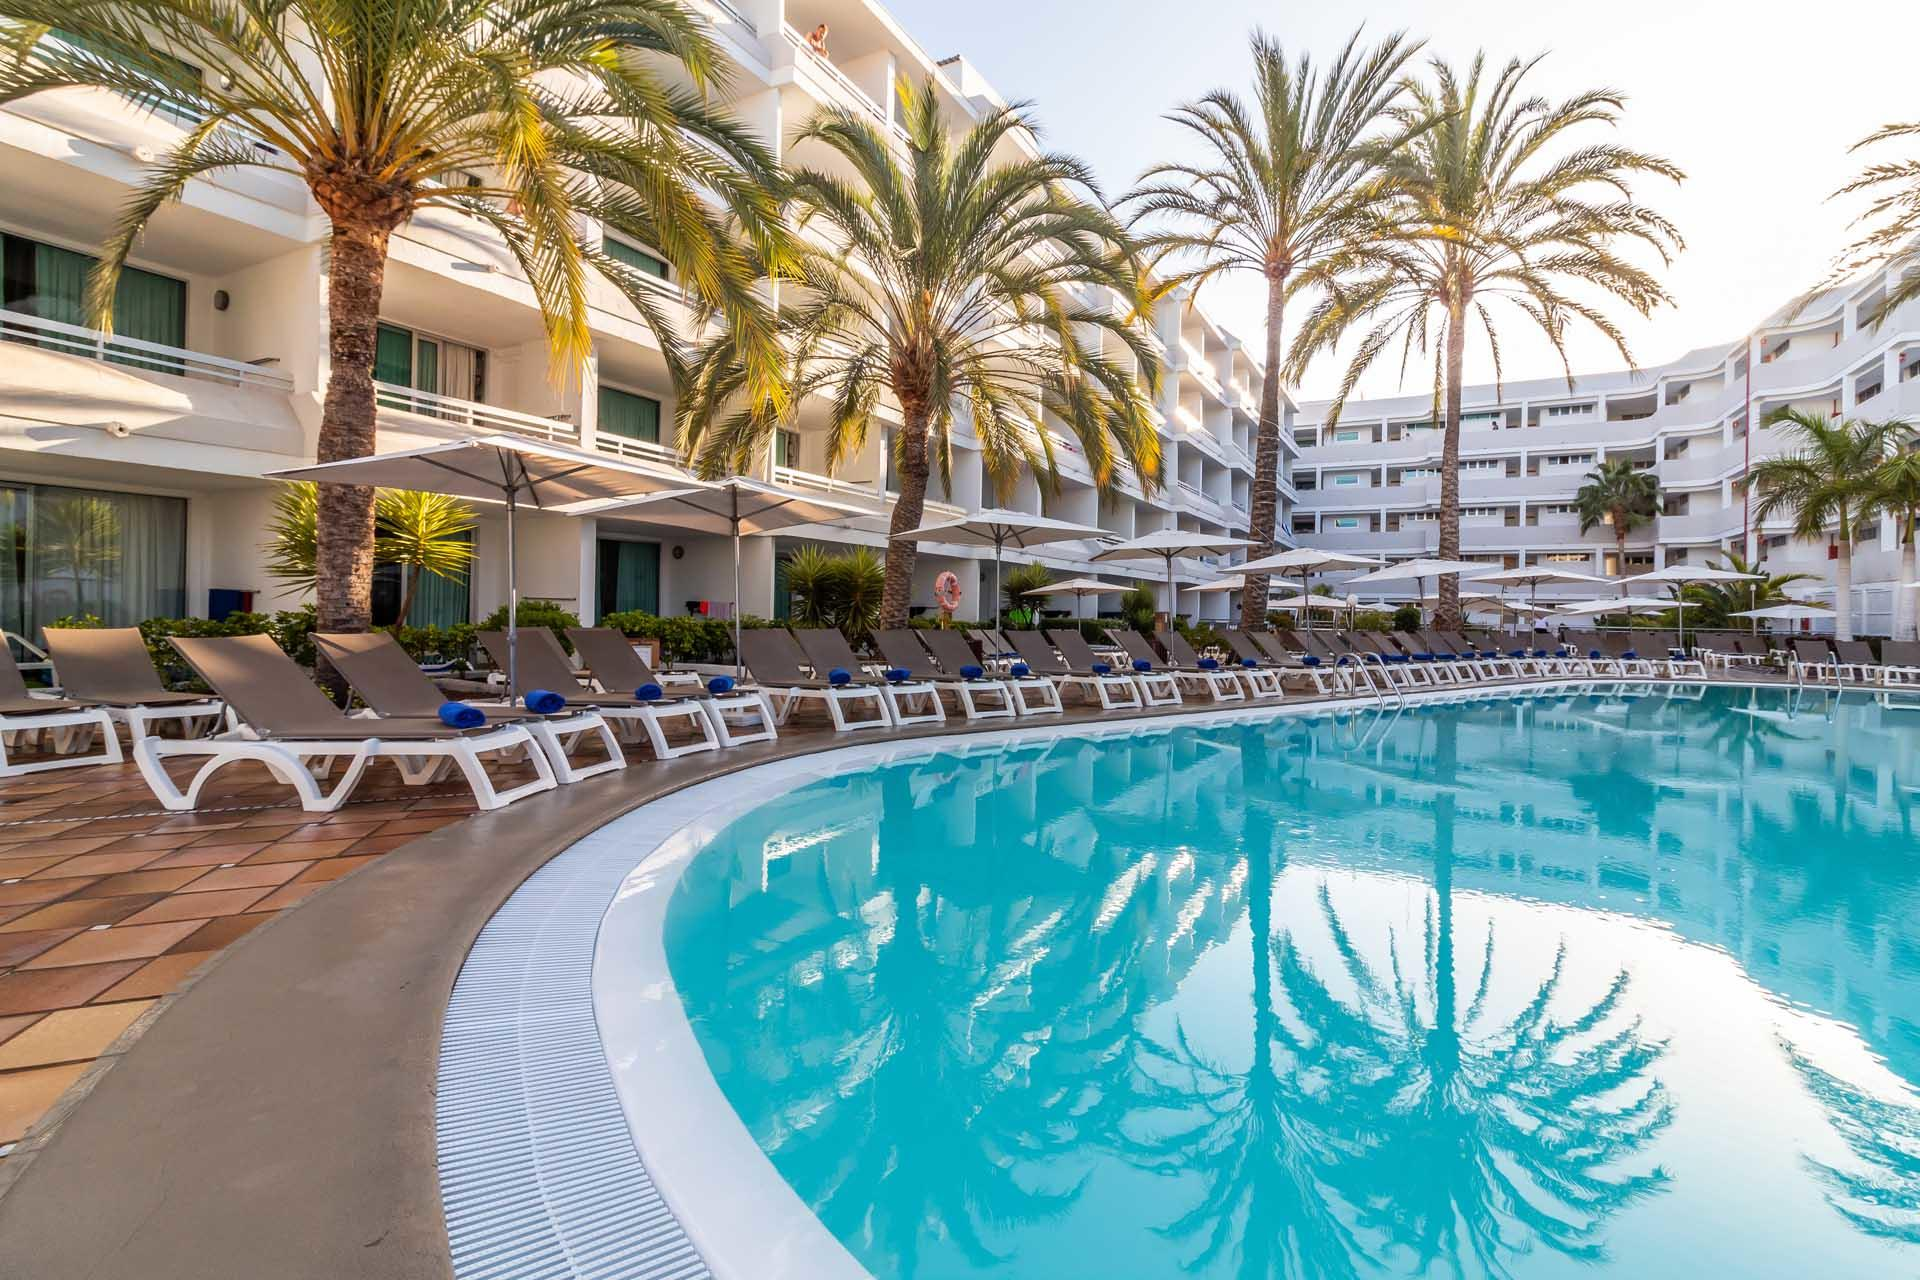 Labranda Bronze Playa Large Pool And Surrounding Chairs And Umbr